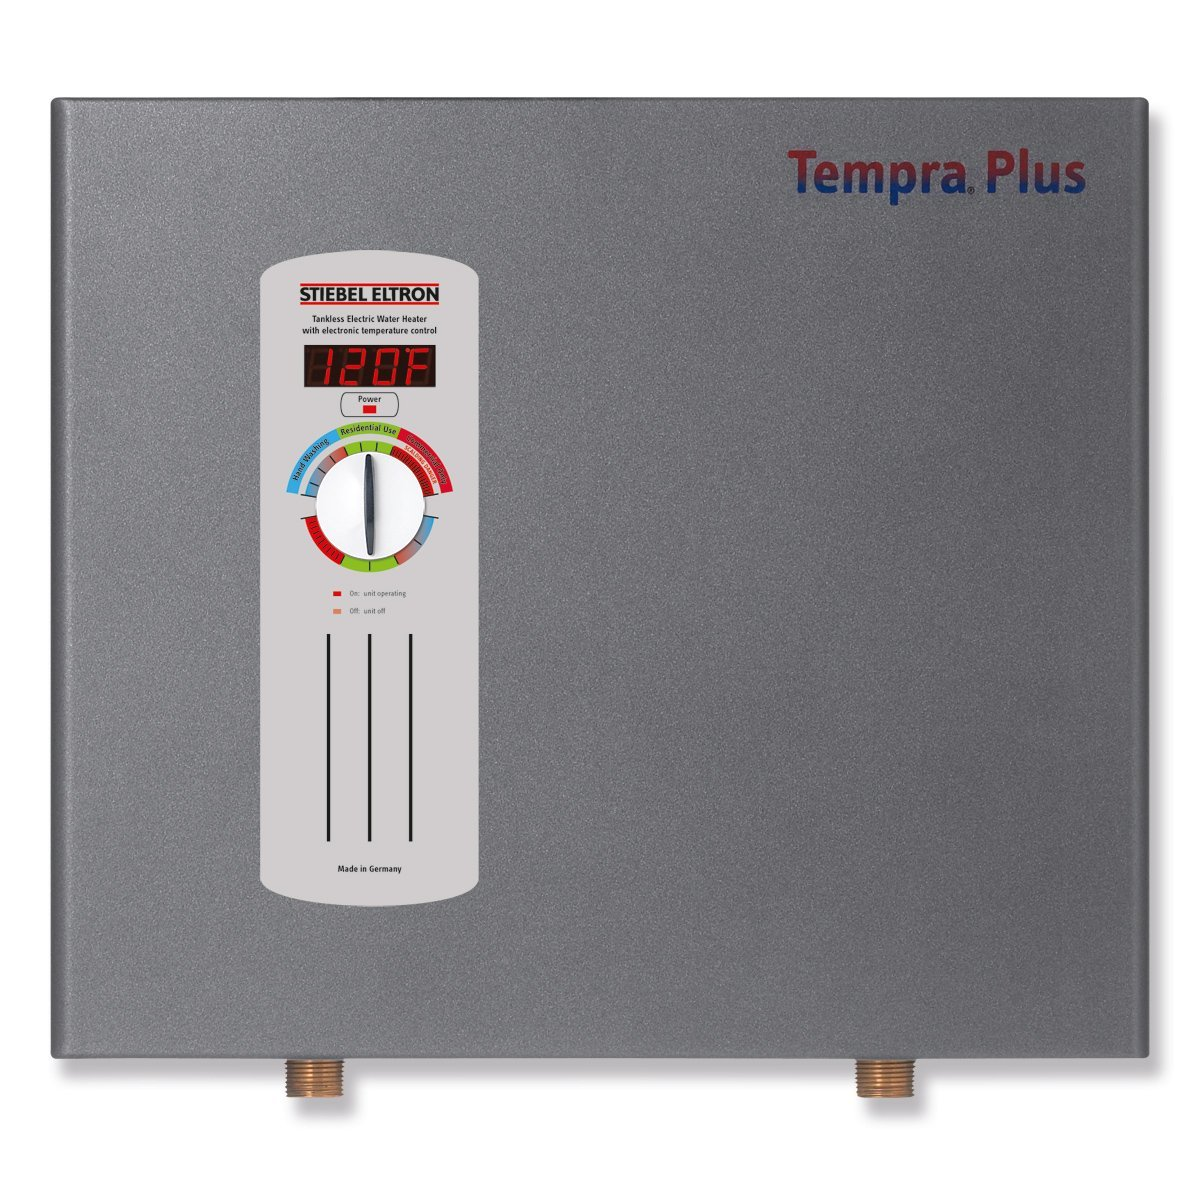 Stiebel Eltron Tempra 36 Plus Tankless Electric Water Heater